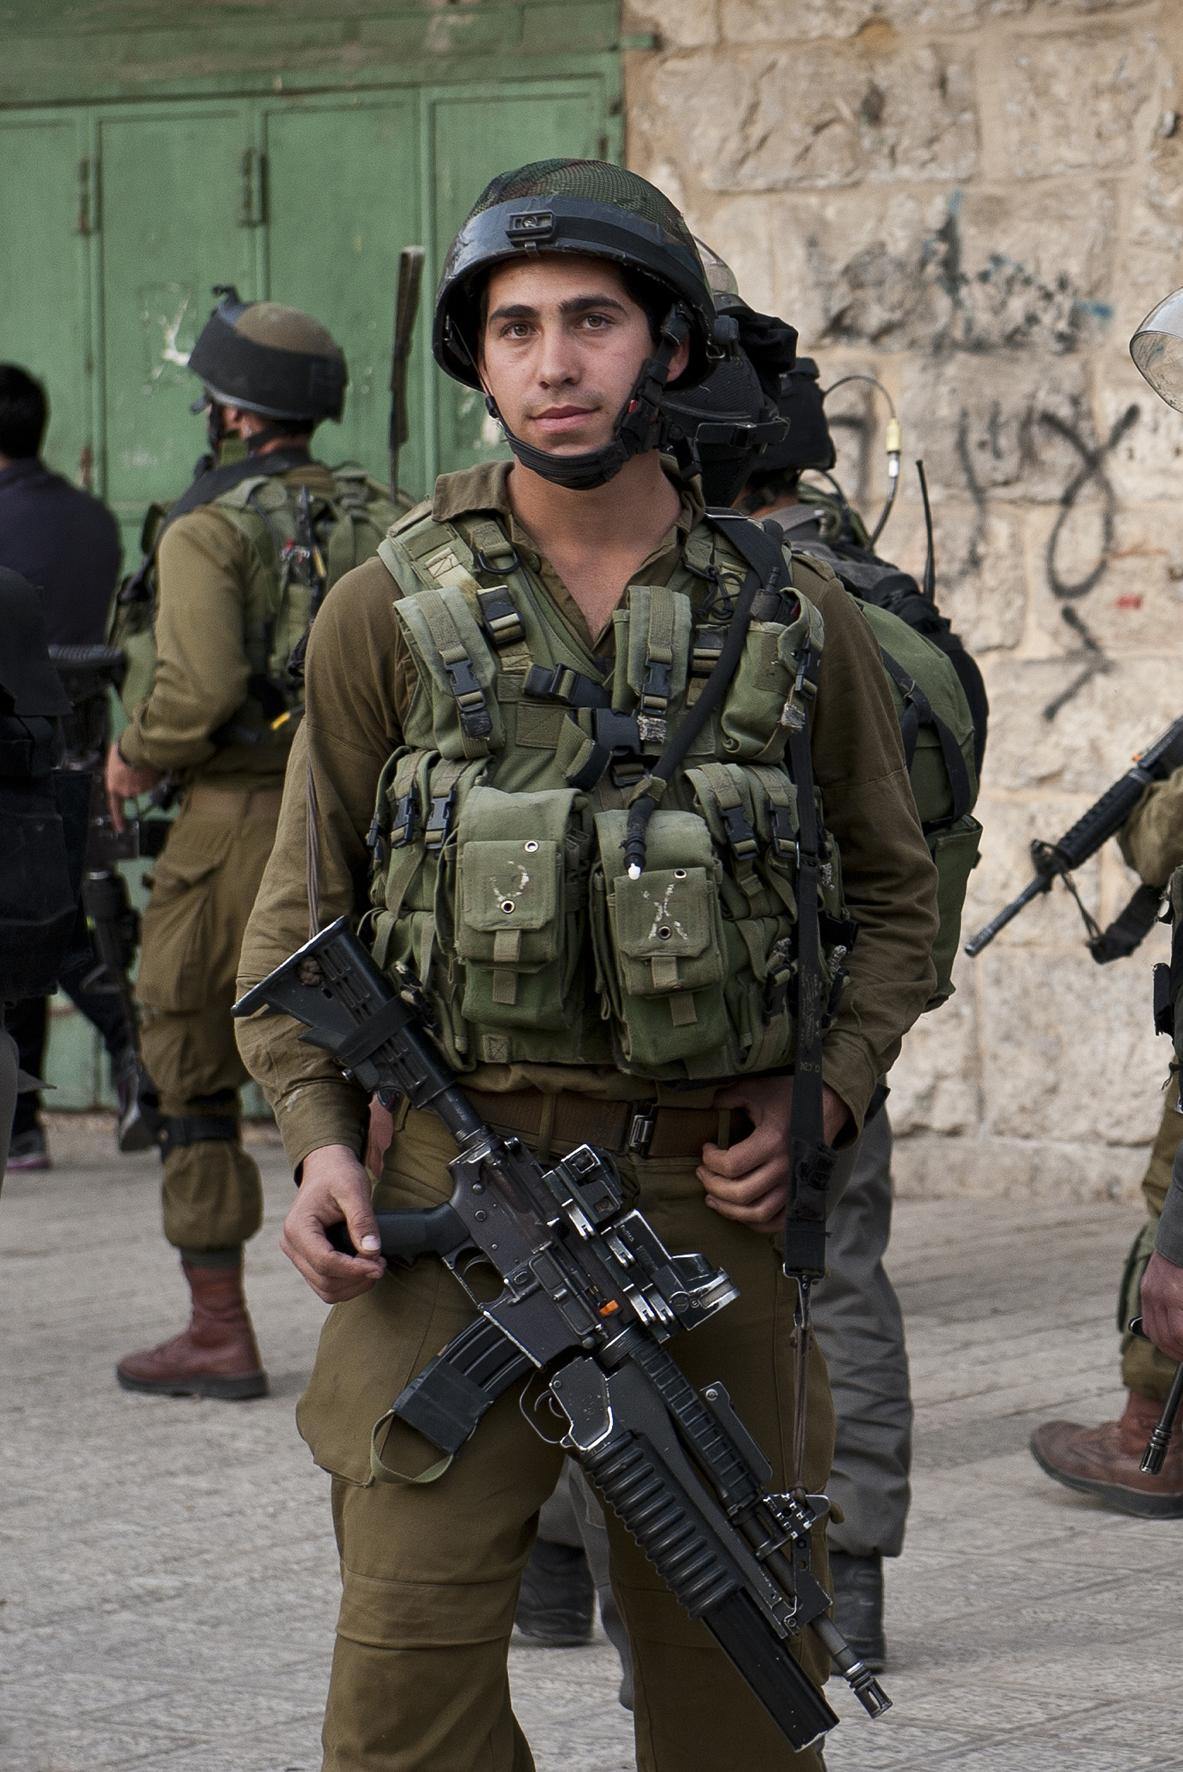 Hebron / Al-Khalil